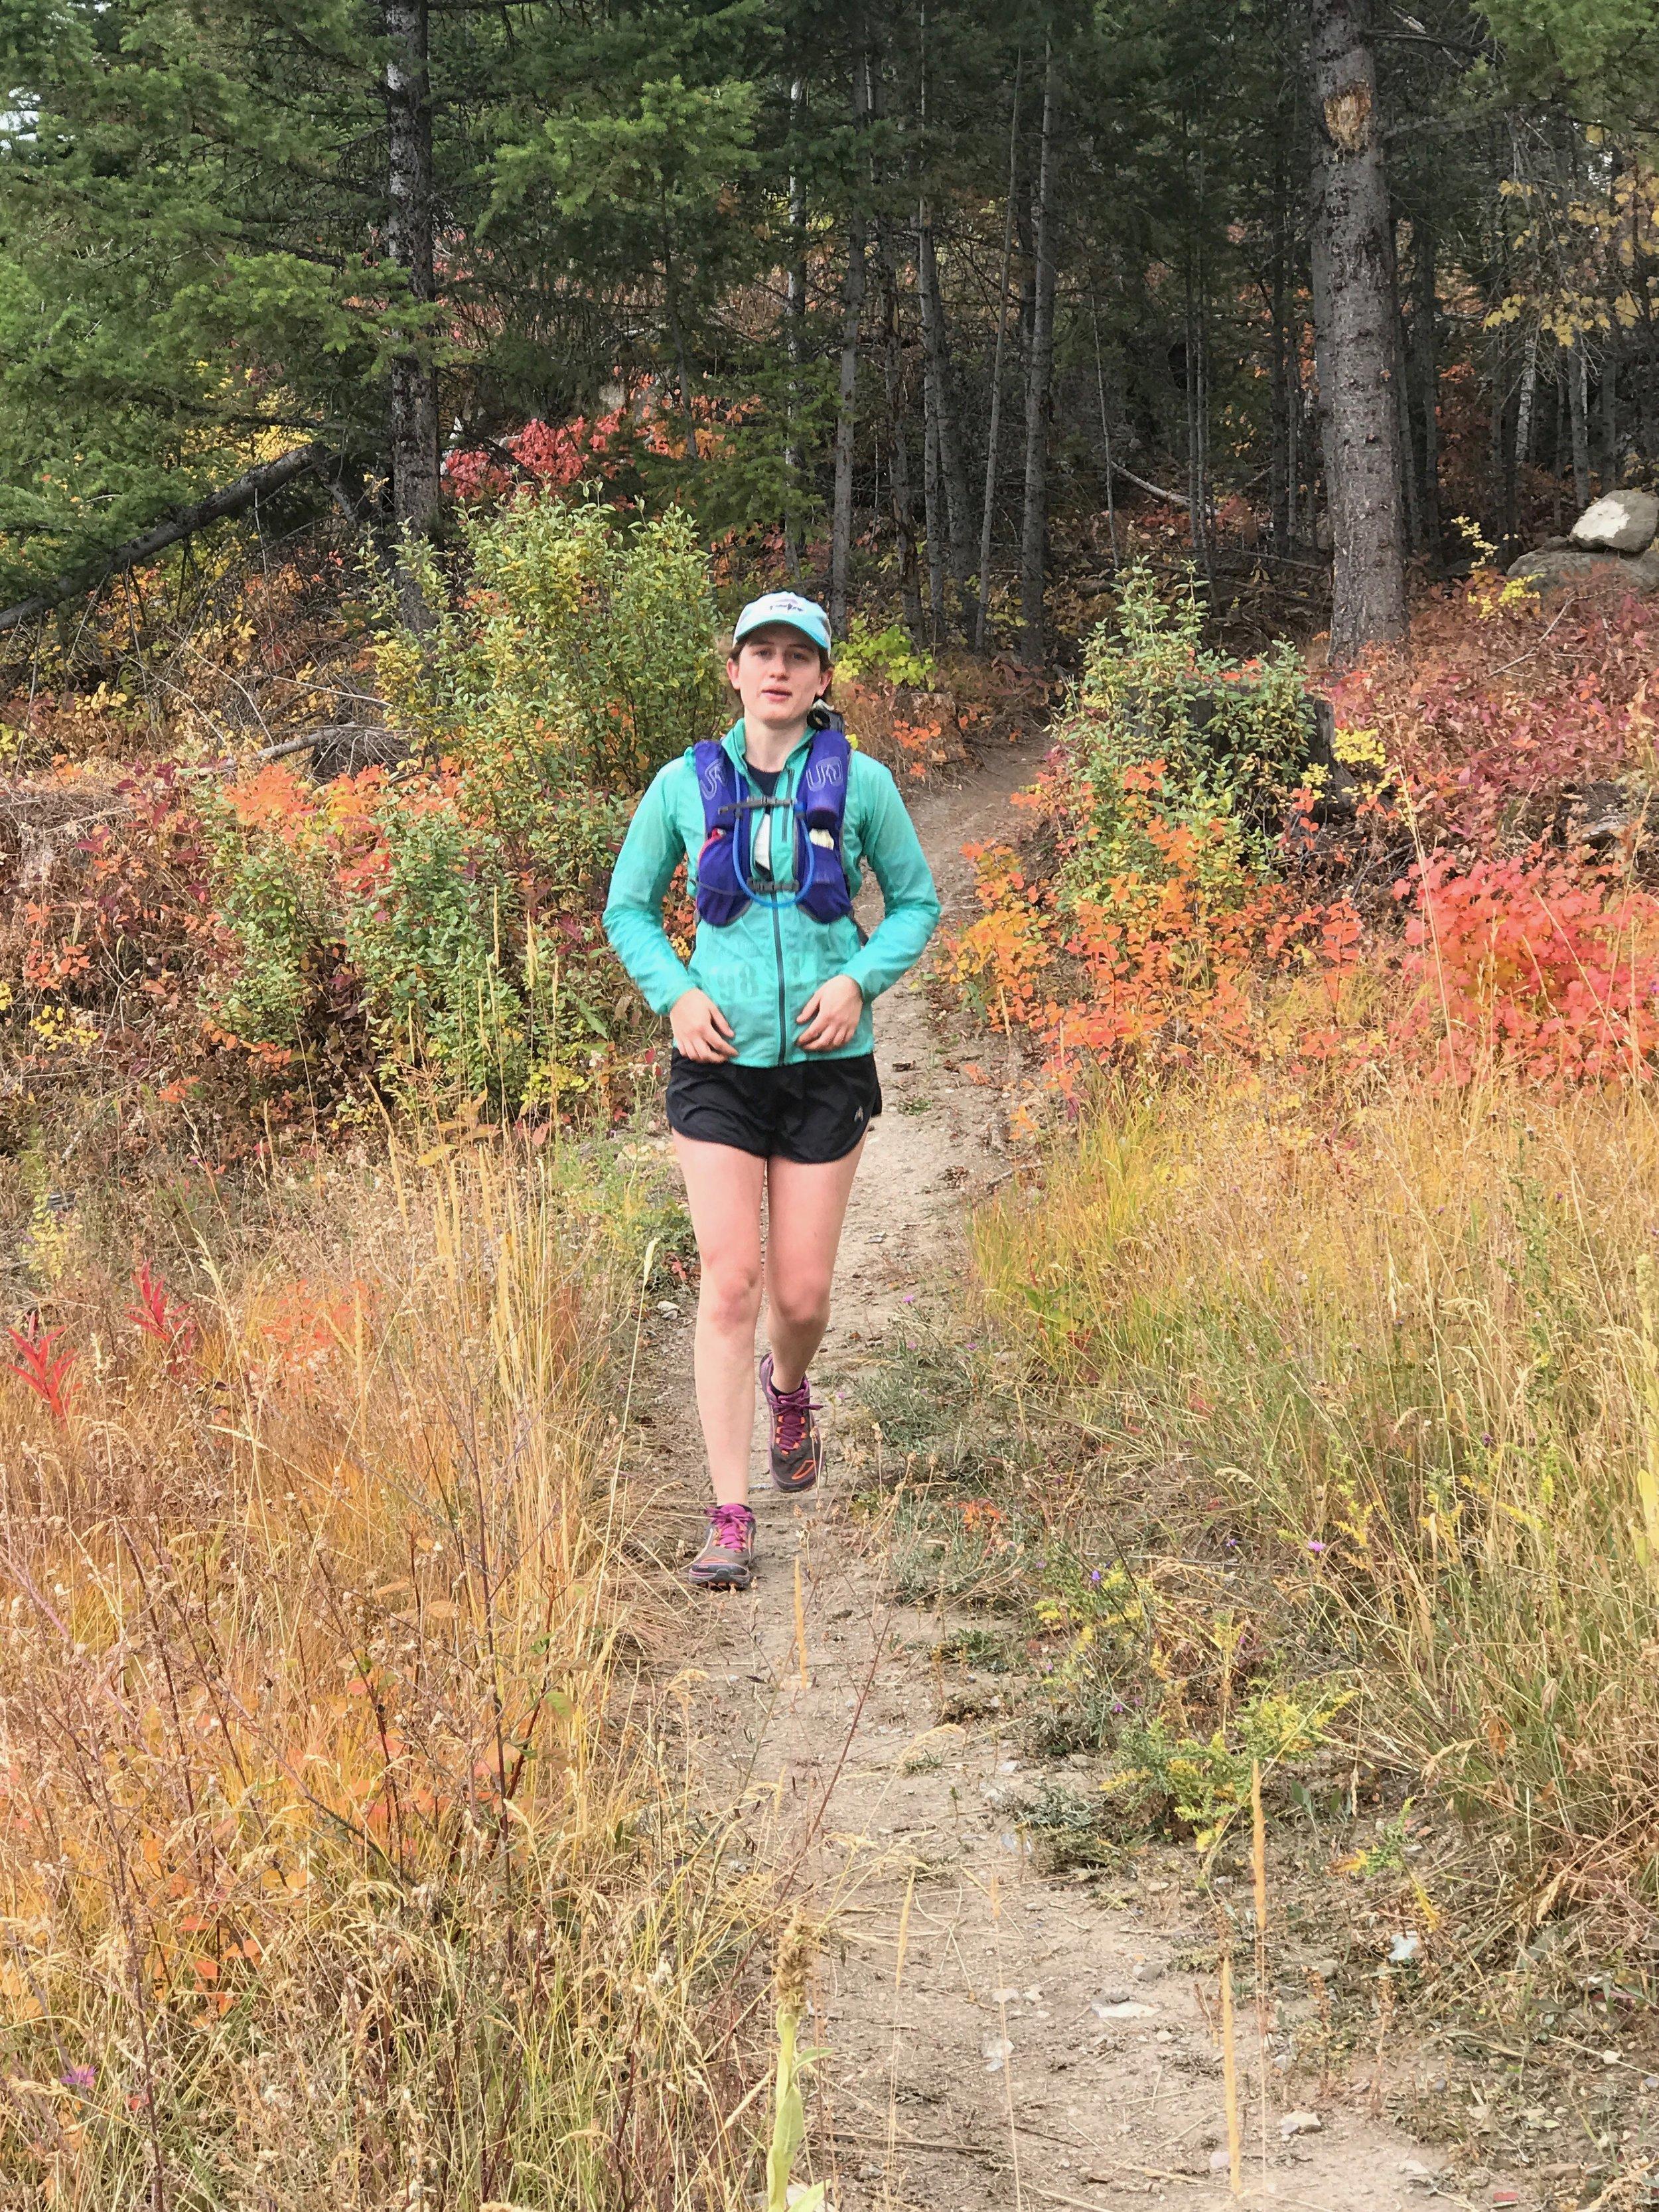 foys to blacktail trails trail marathon ftbtIMG_1764.JPG